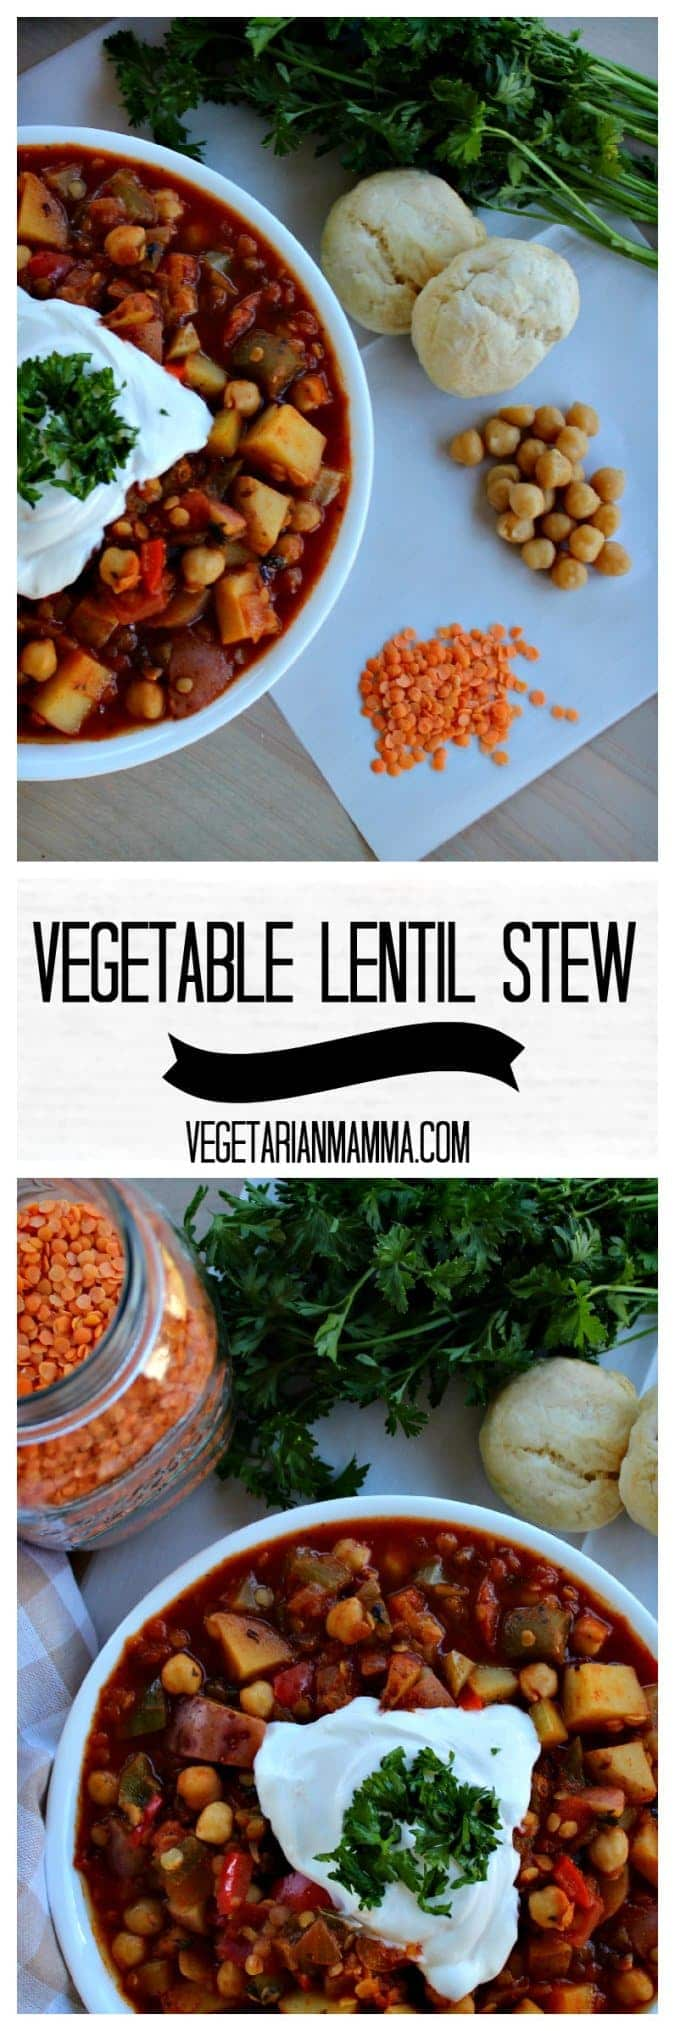 Vegetable Lentil Stew @vegetarianmamma.com #glutenfree #nutfree #dairyfree #stew #vegetarian #vegetable